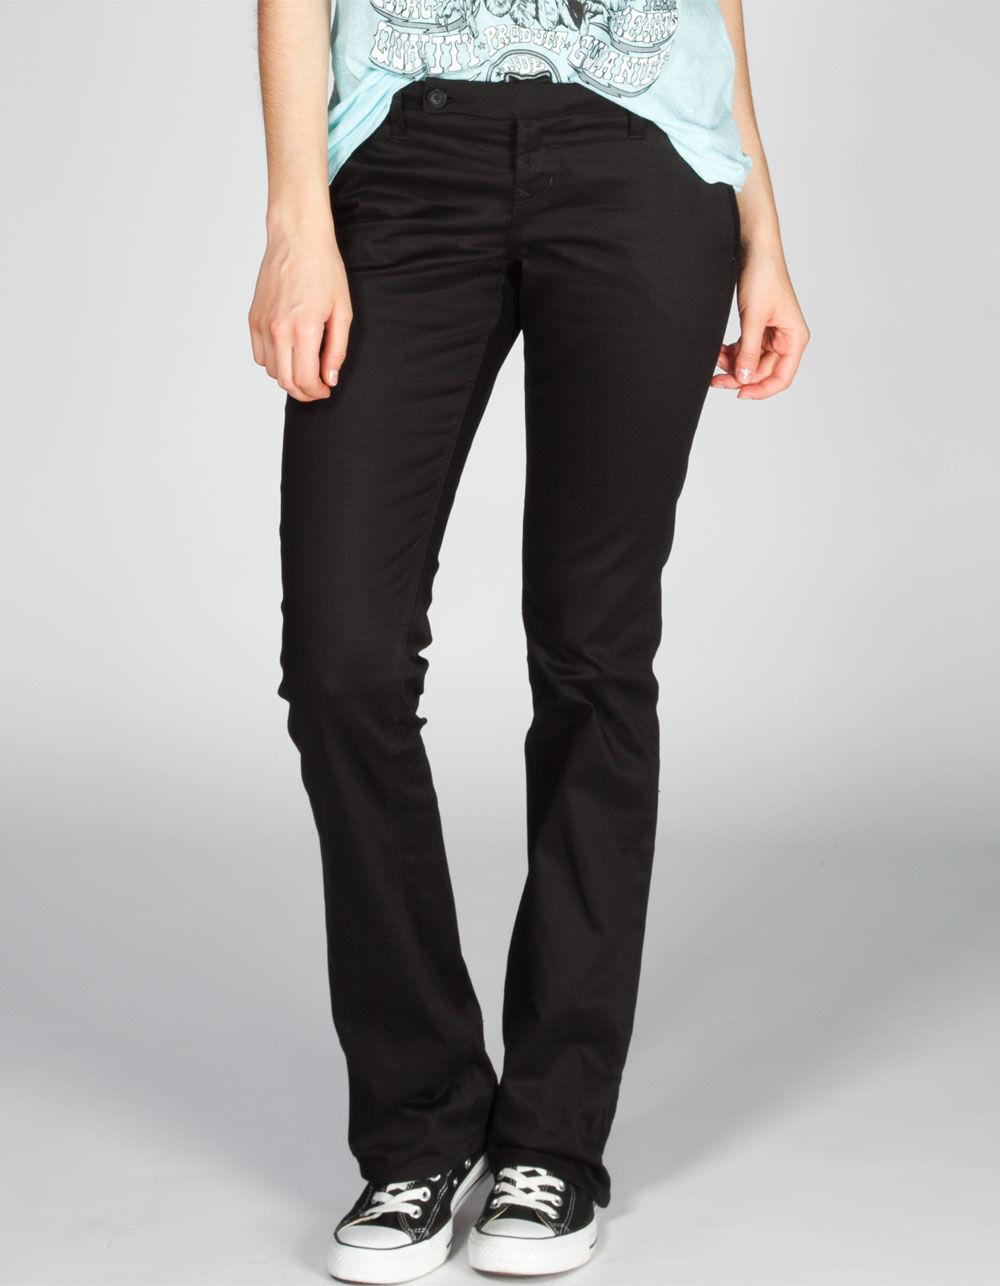 DICKIES Reva Womens Pants